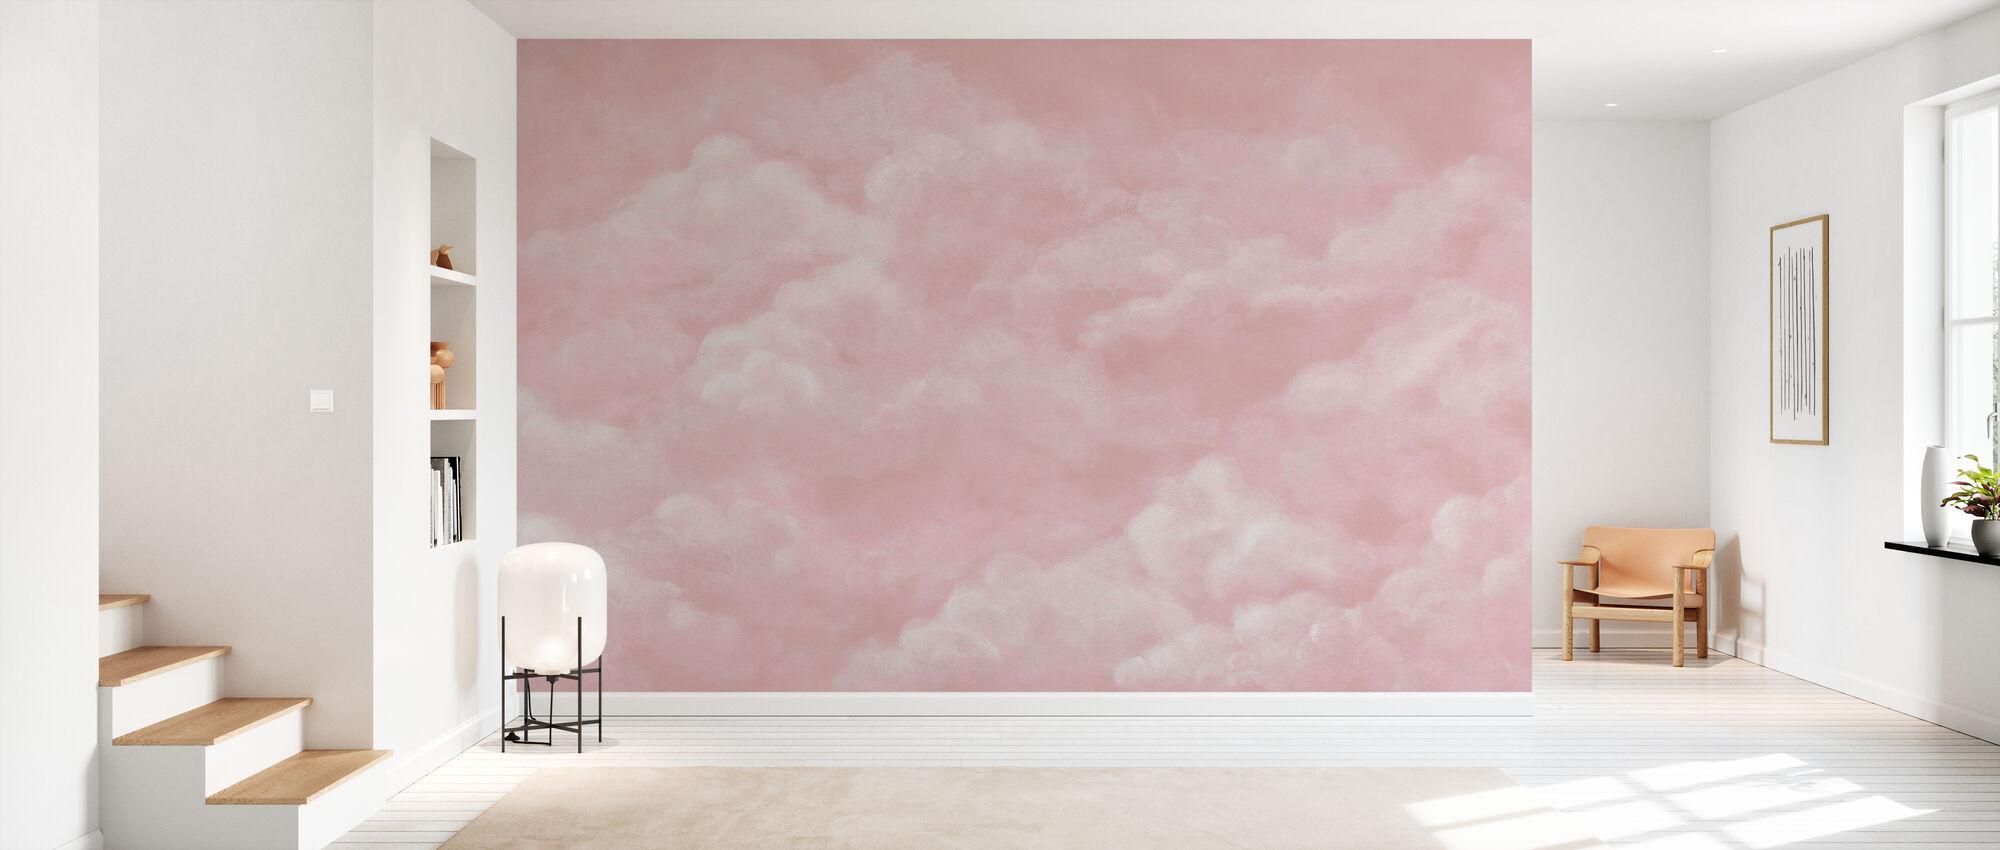 Tender Clouds - Pink - Wallpaper - Hallway